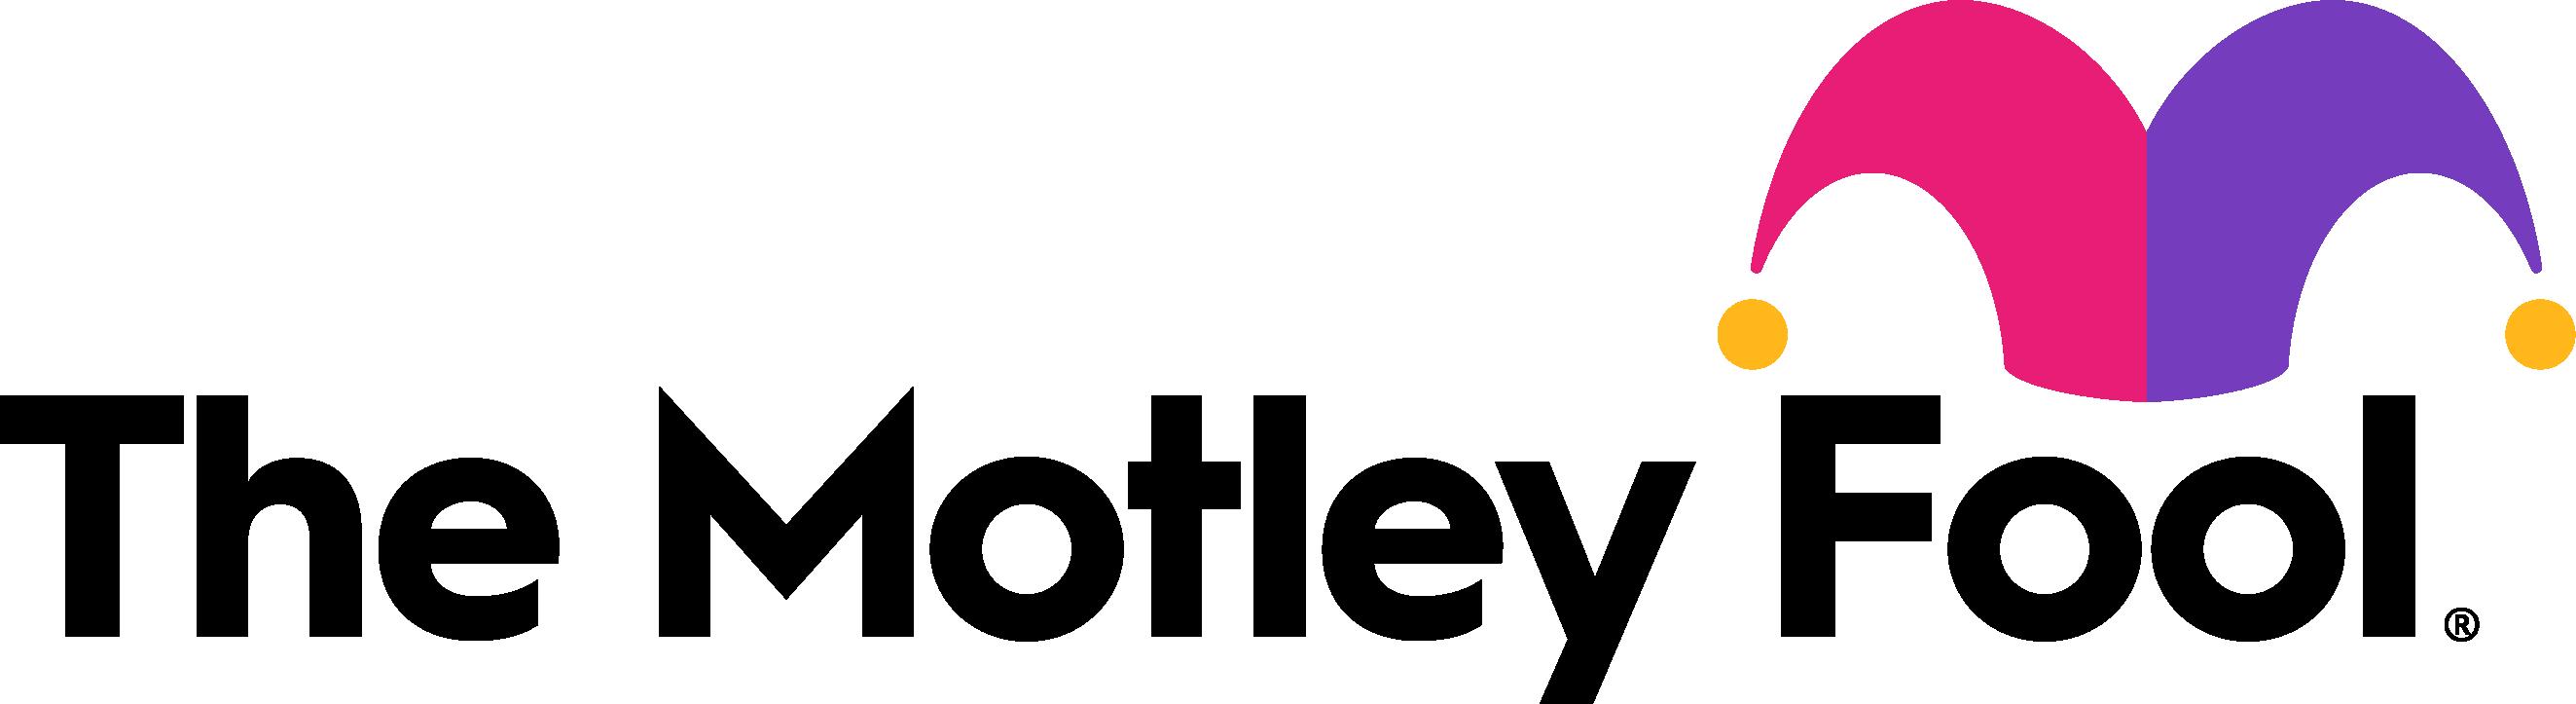 TMF_HoldingCo_Logo_Primary_Magenta_RoyalPurple